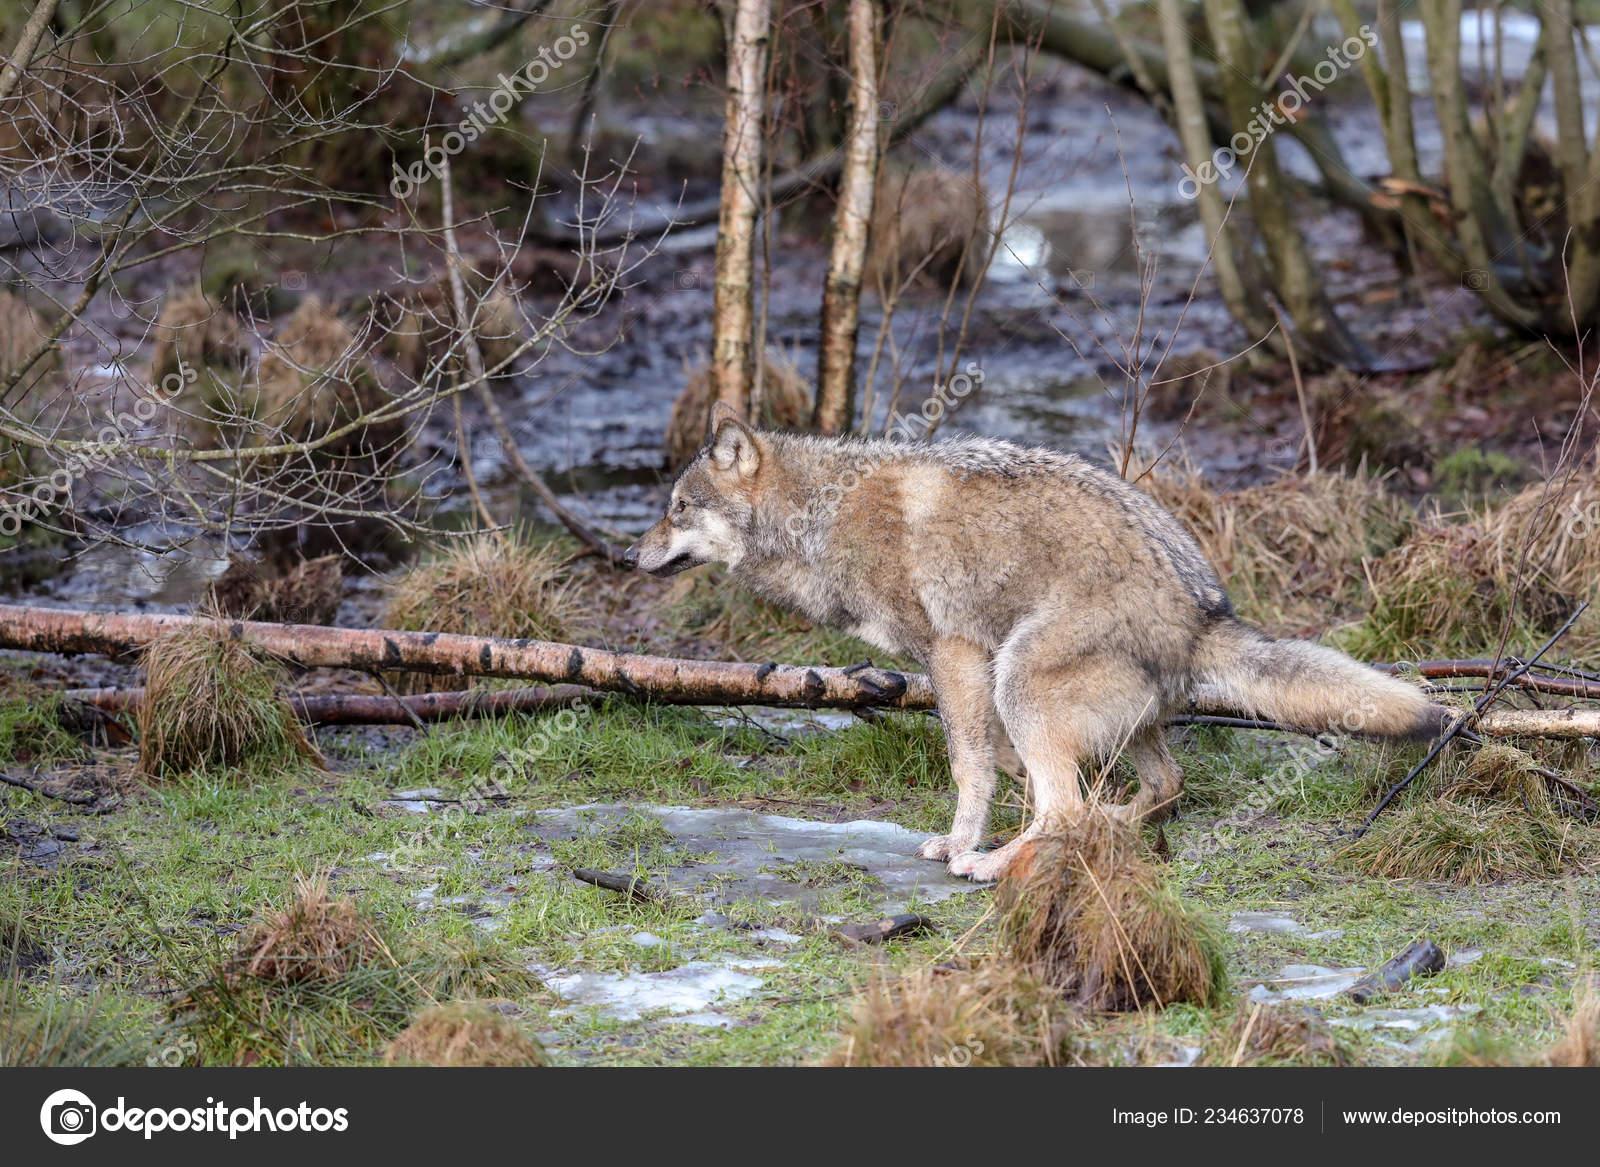 Pic of deer poop | Grey wolf, Canis lupus, defecating in the